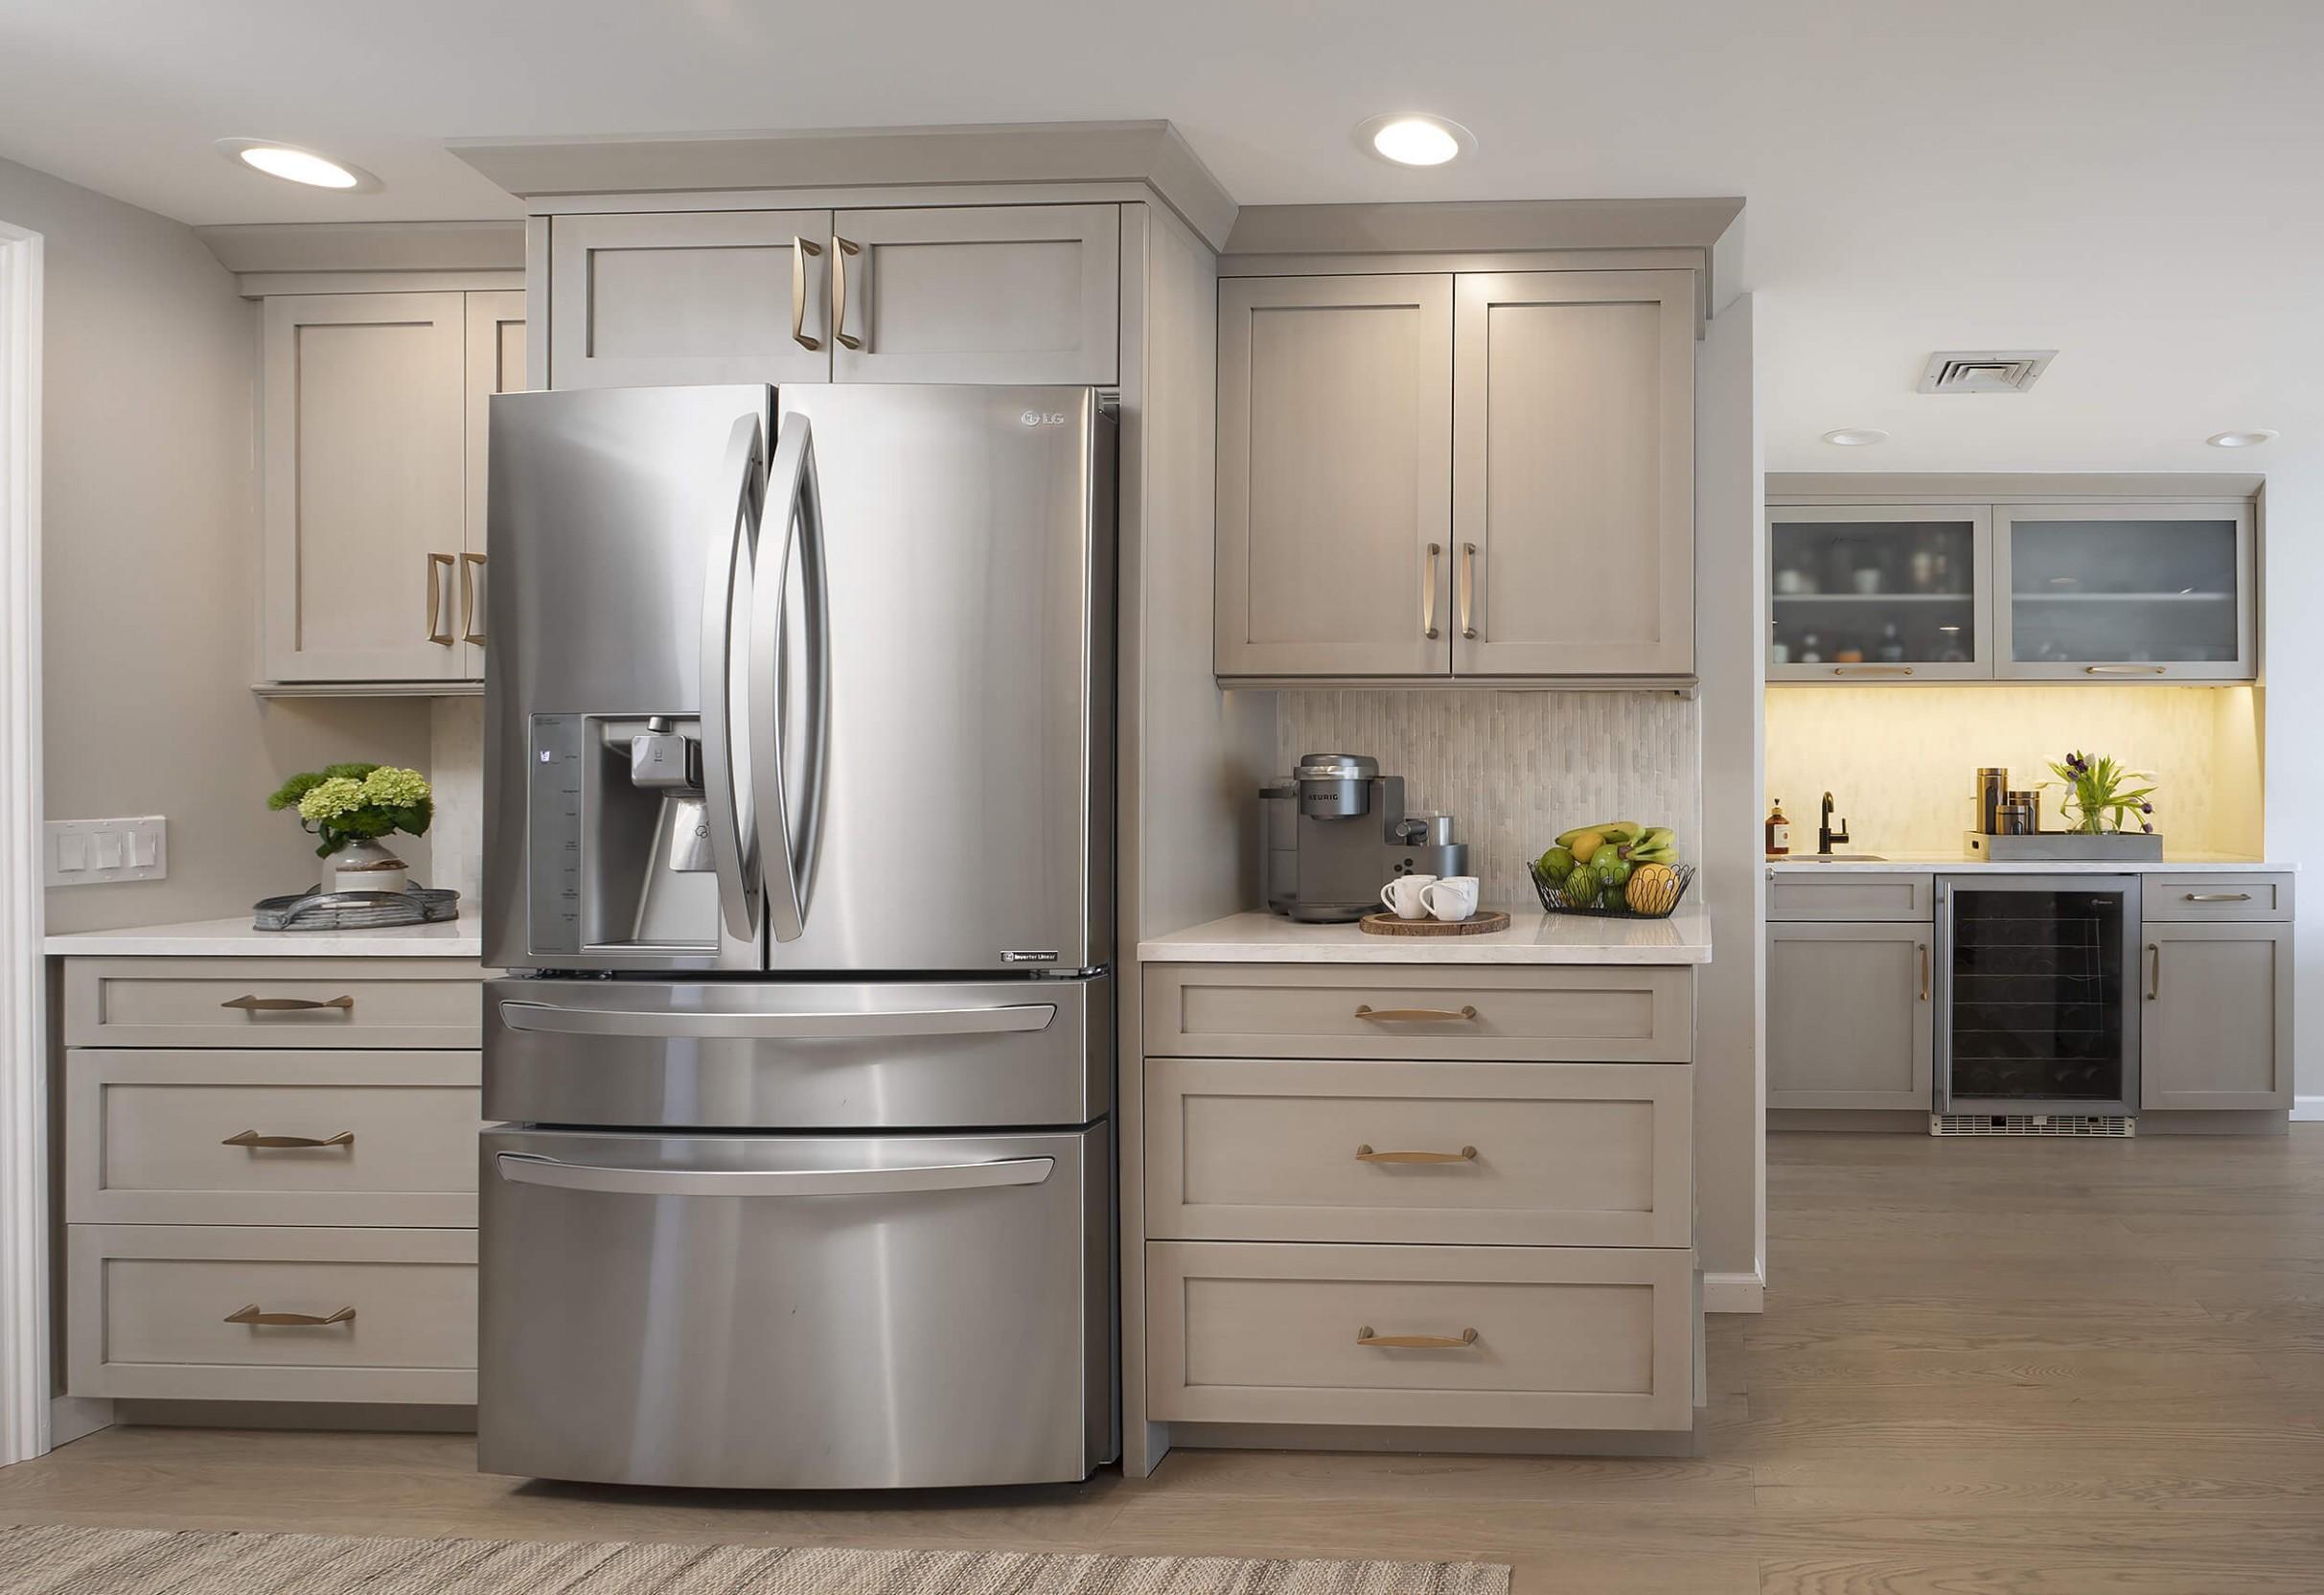 Hamden Kitchen - Fridge Cabinets  Viking Kitchen Cabinets - Kitchen Fridge Cabinet